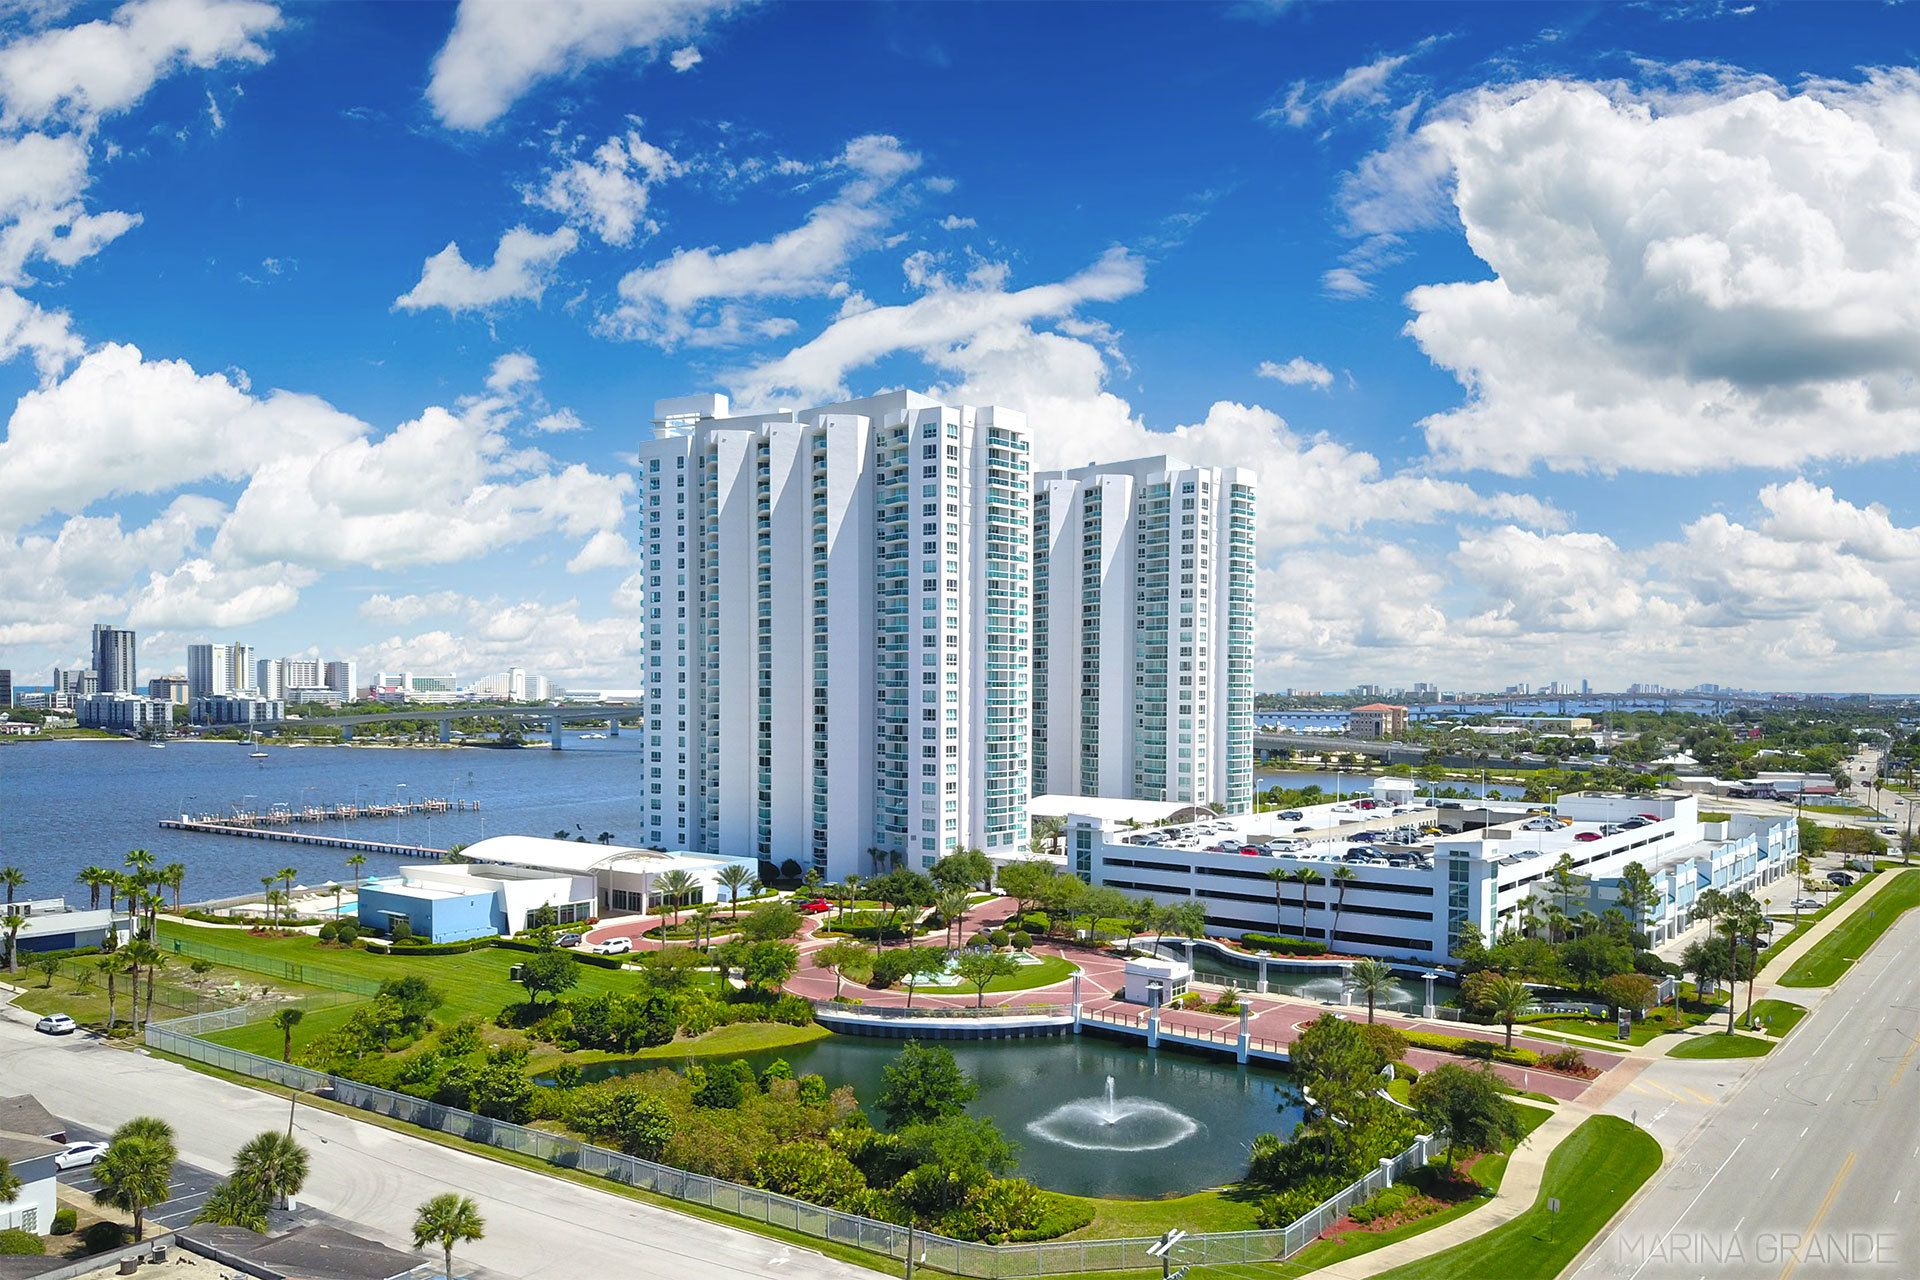 Marina Grande riverfront condos for sale in Daytona Beach